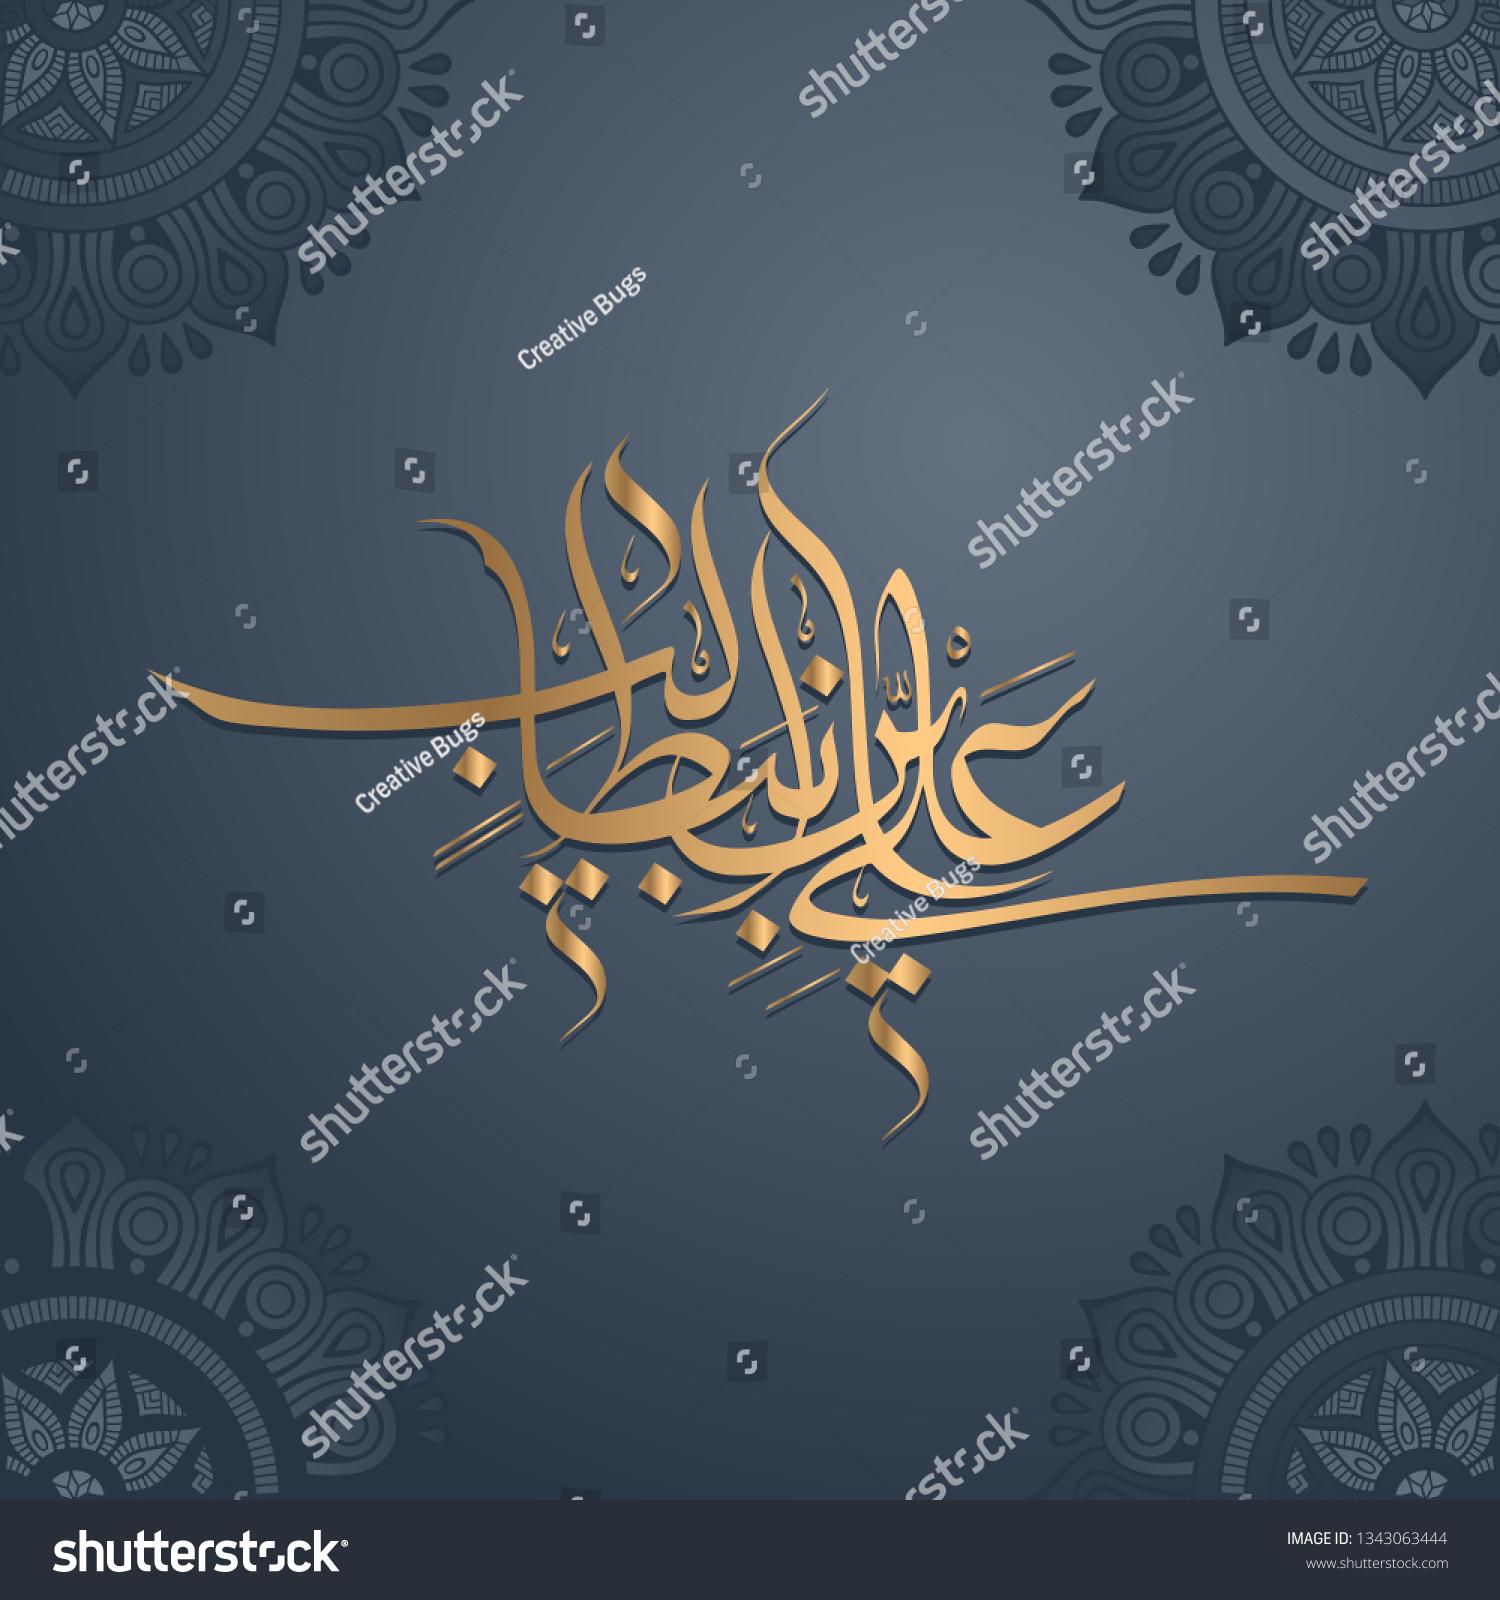 Arabic Hazrat Ali Bin Abi Thalib Stock Vector (Royalty Free